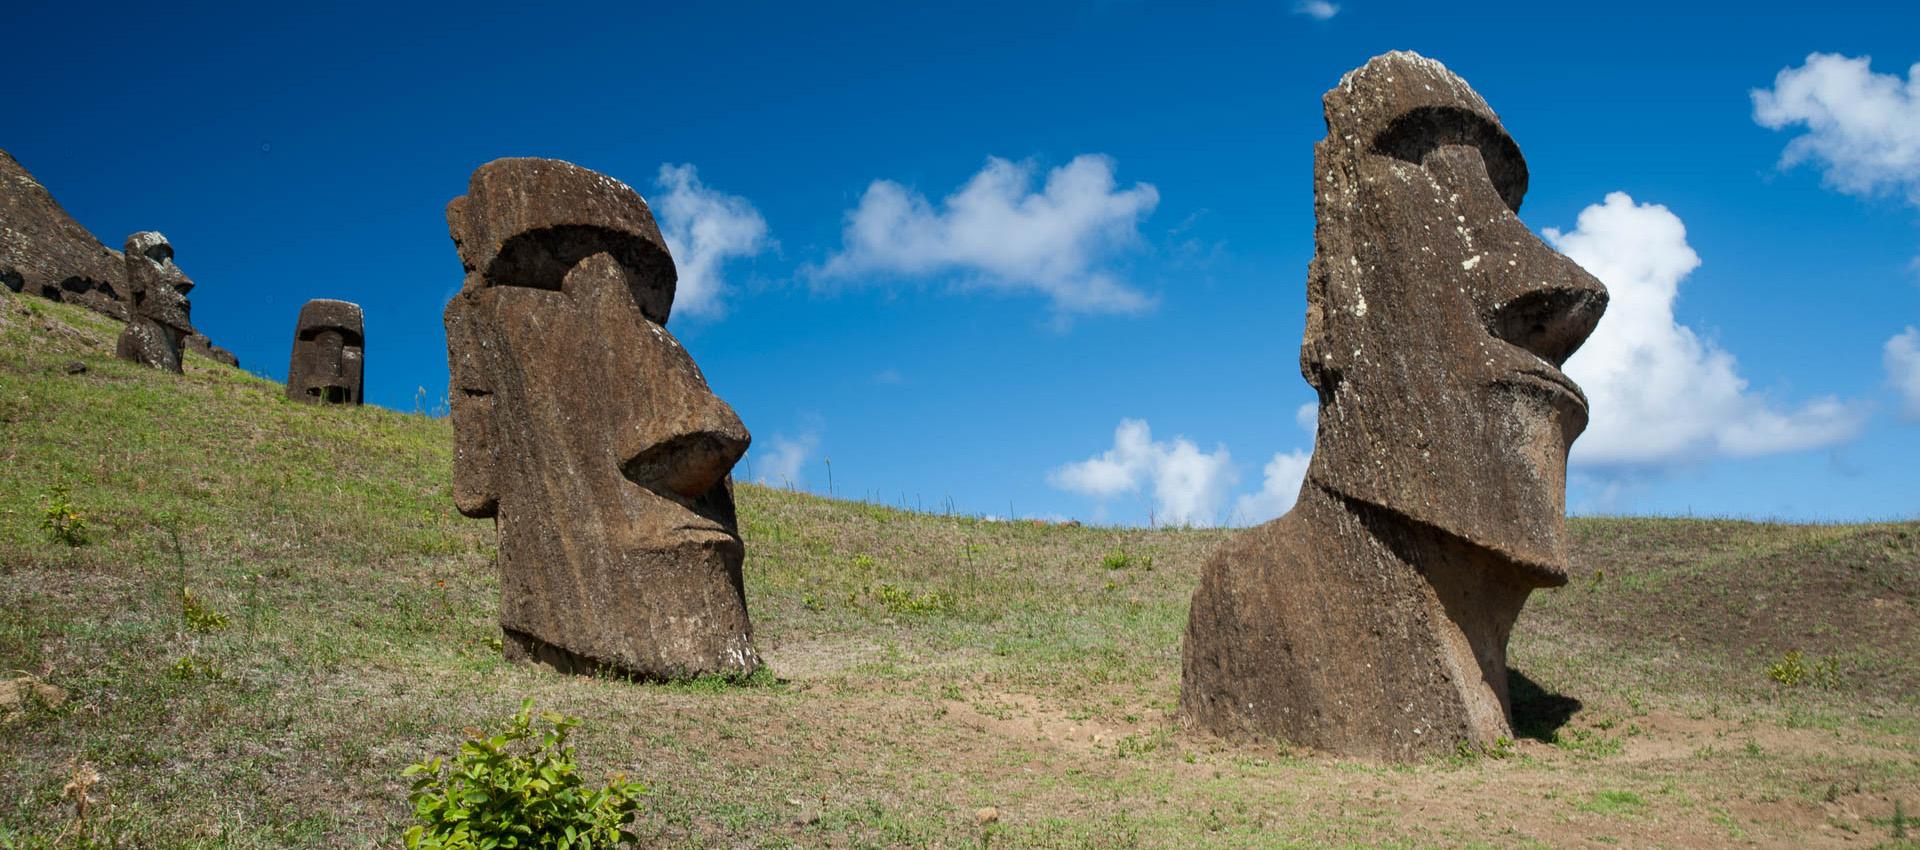 Rano Raraku quarry, Easter island - abandoned heads